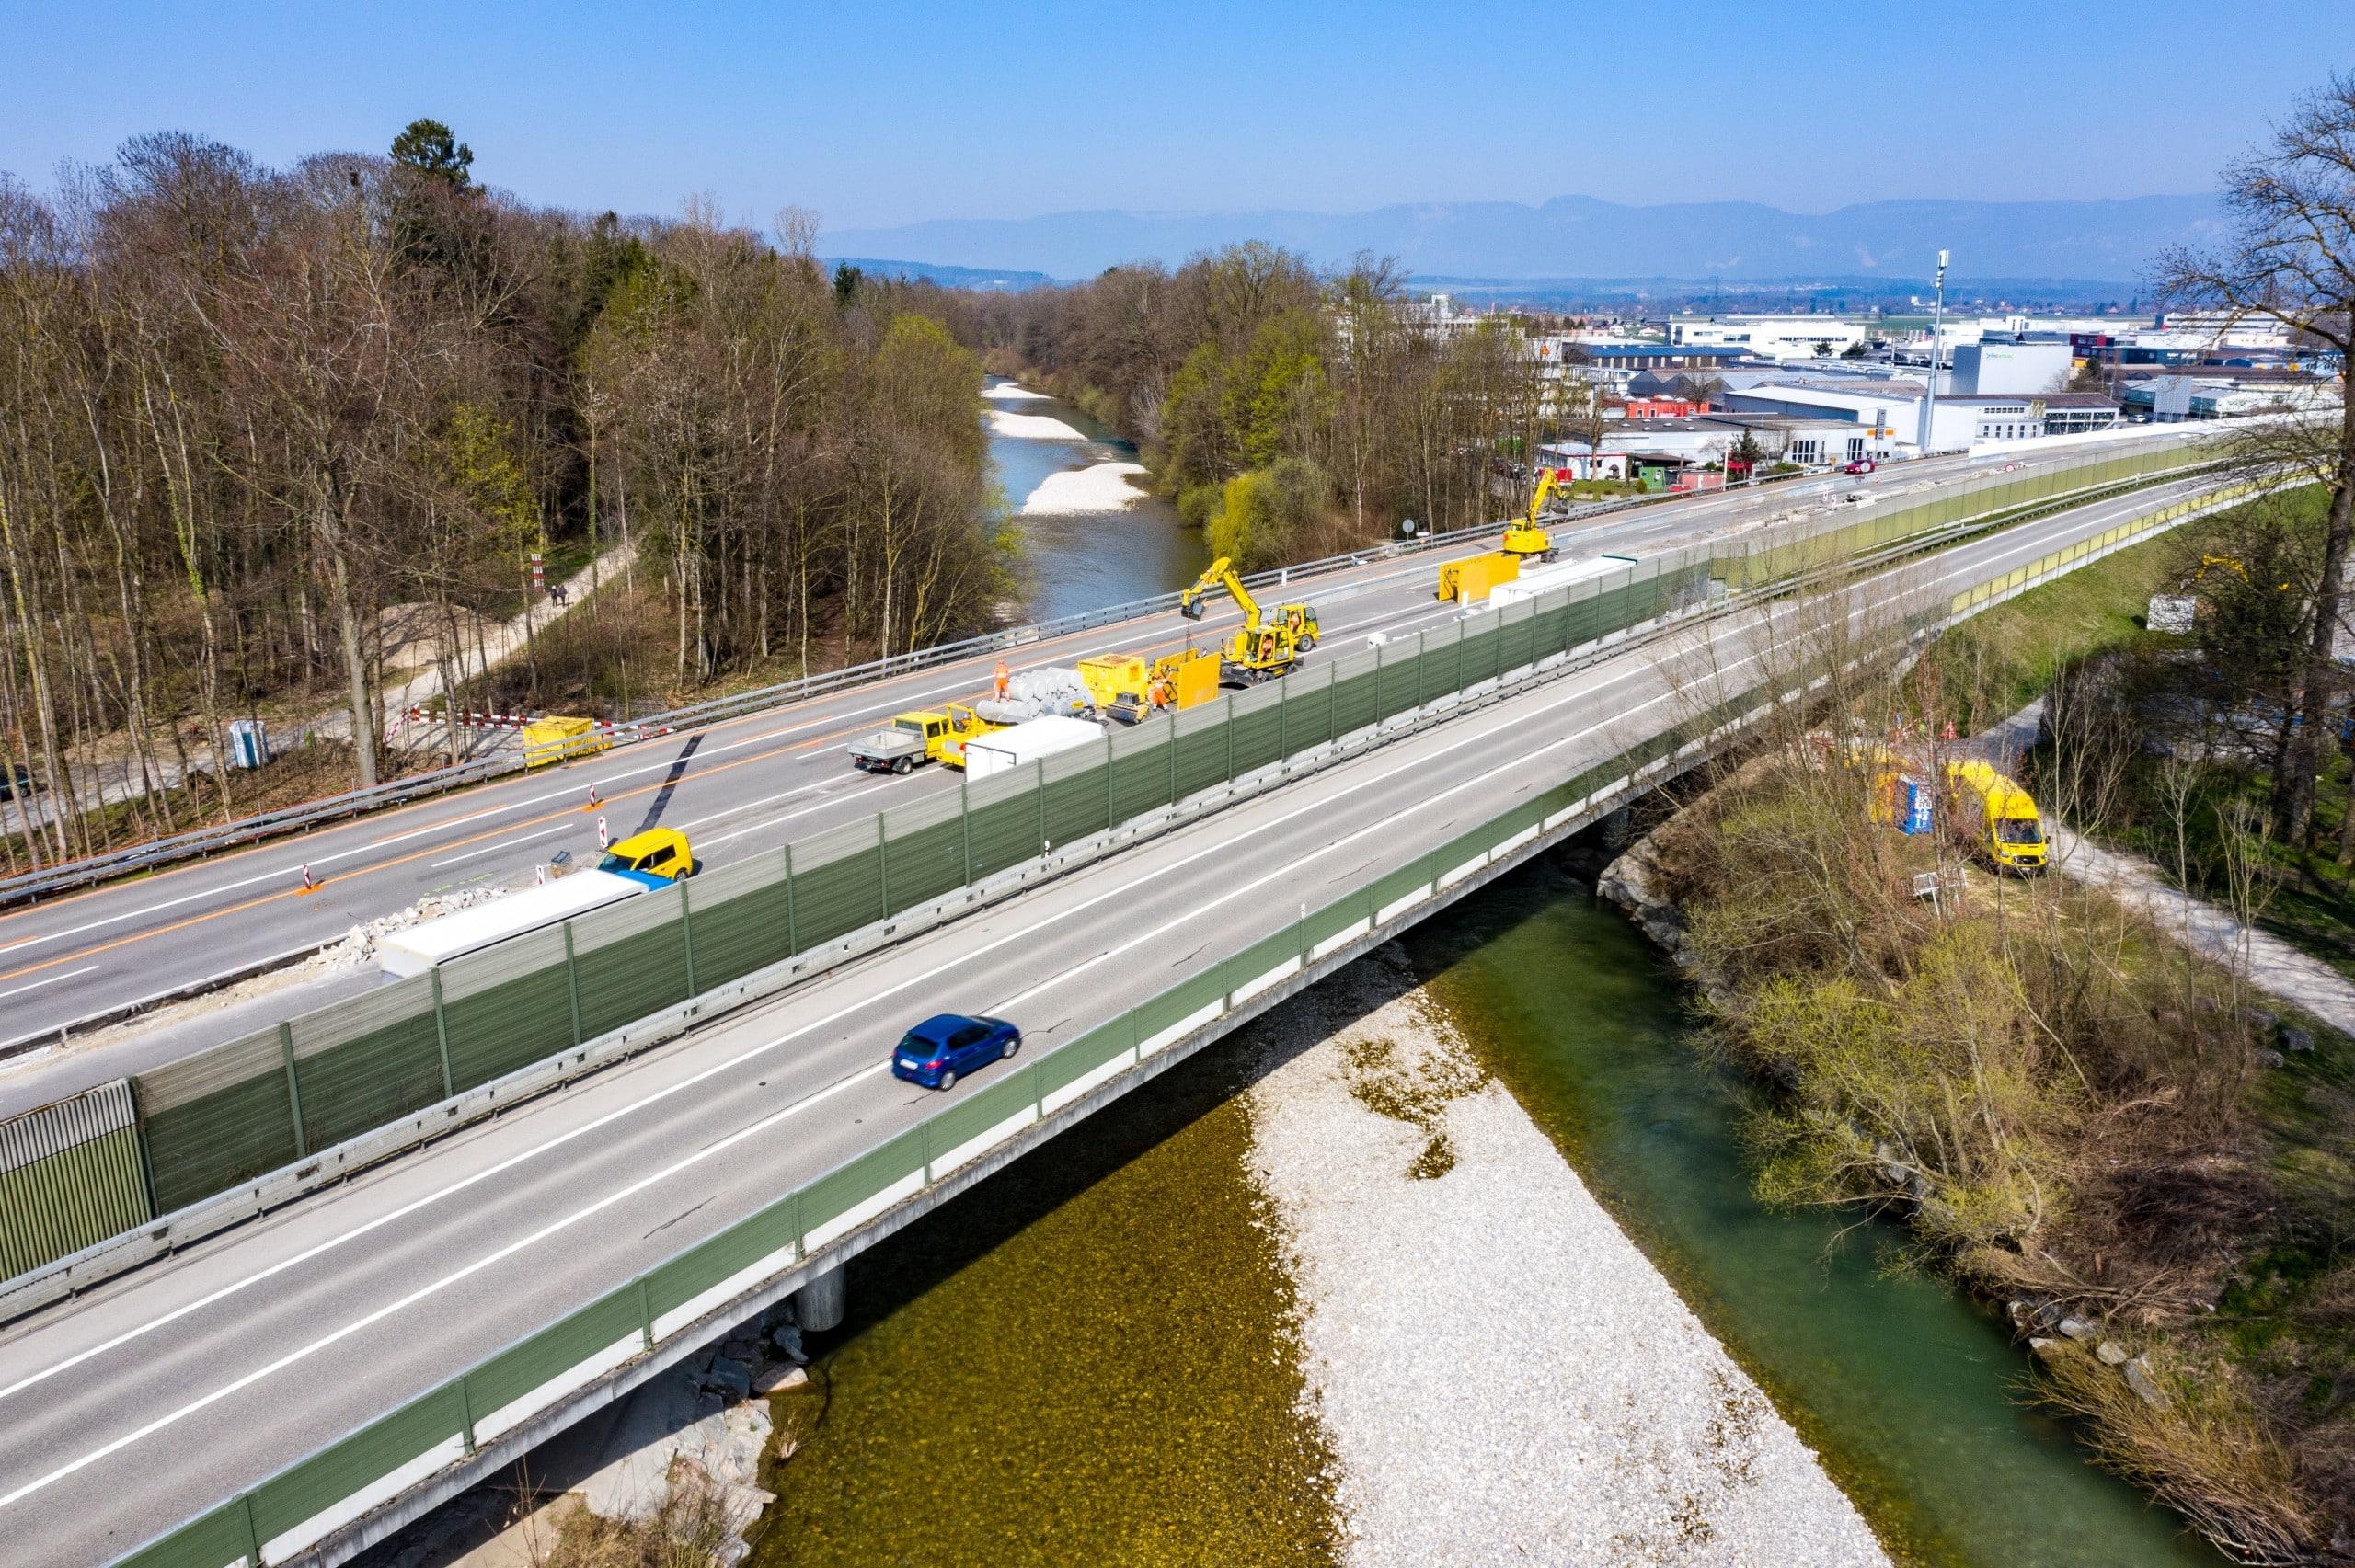 Drohne Luftaufnahme Fotograf Bern